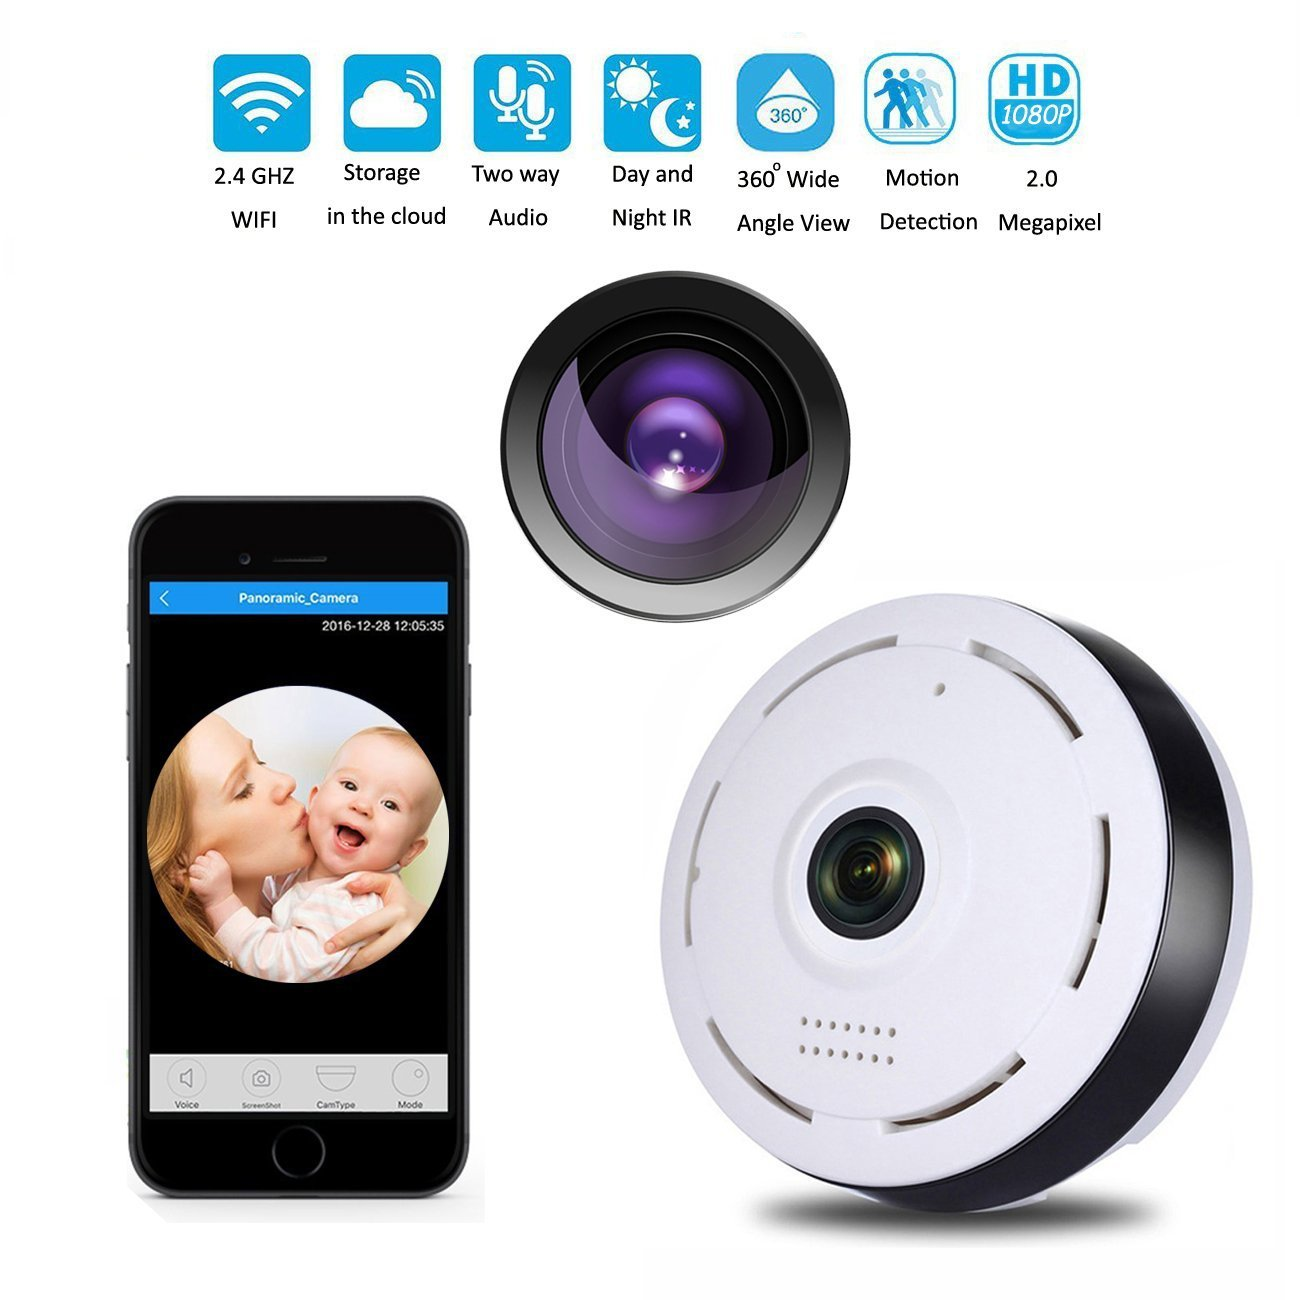 WiFi Wireless Panoramic Camera HD 360 Degree Night Vision Fisheye Security Camera white_AU plug